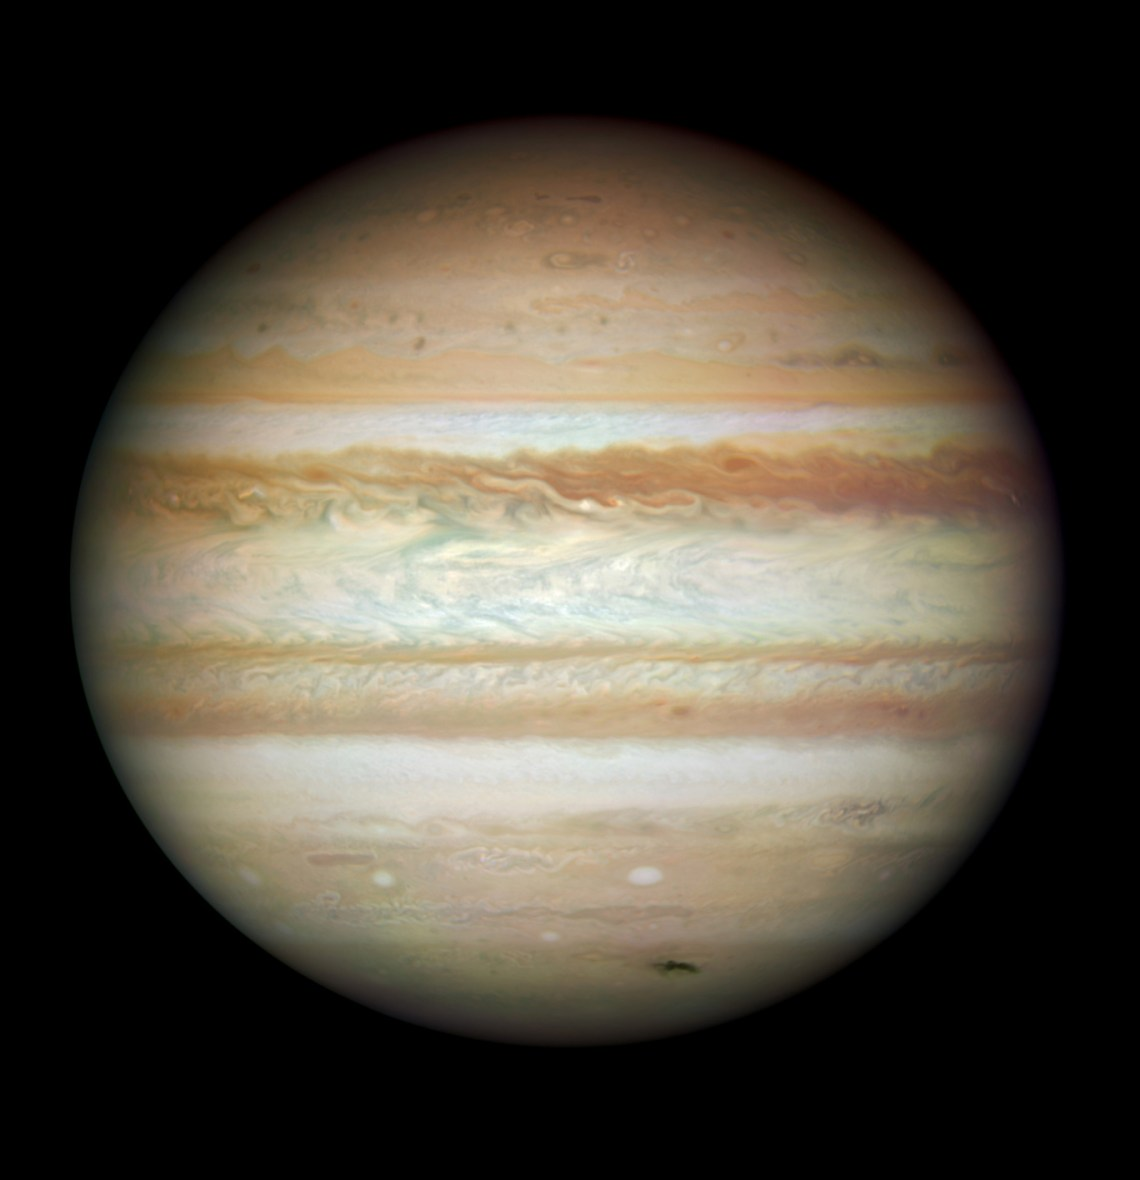 HUBBLE'S TOP 100 •#42 • Credit: NASA, ESA, Michael Wong (Space Telescope Science Institute, Baltimore, MD), H. B. Hammel (Space Science Institute, Boulder, CO) and the Jupiter Impact Team